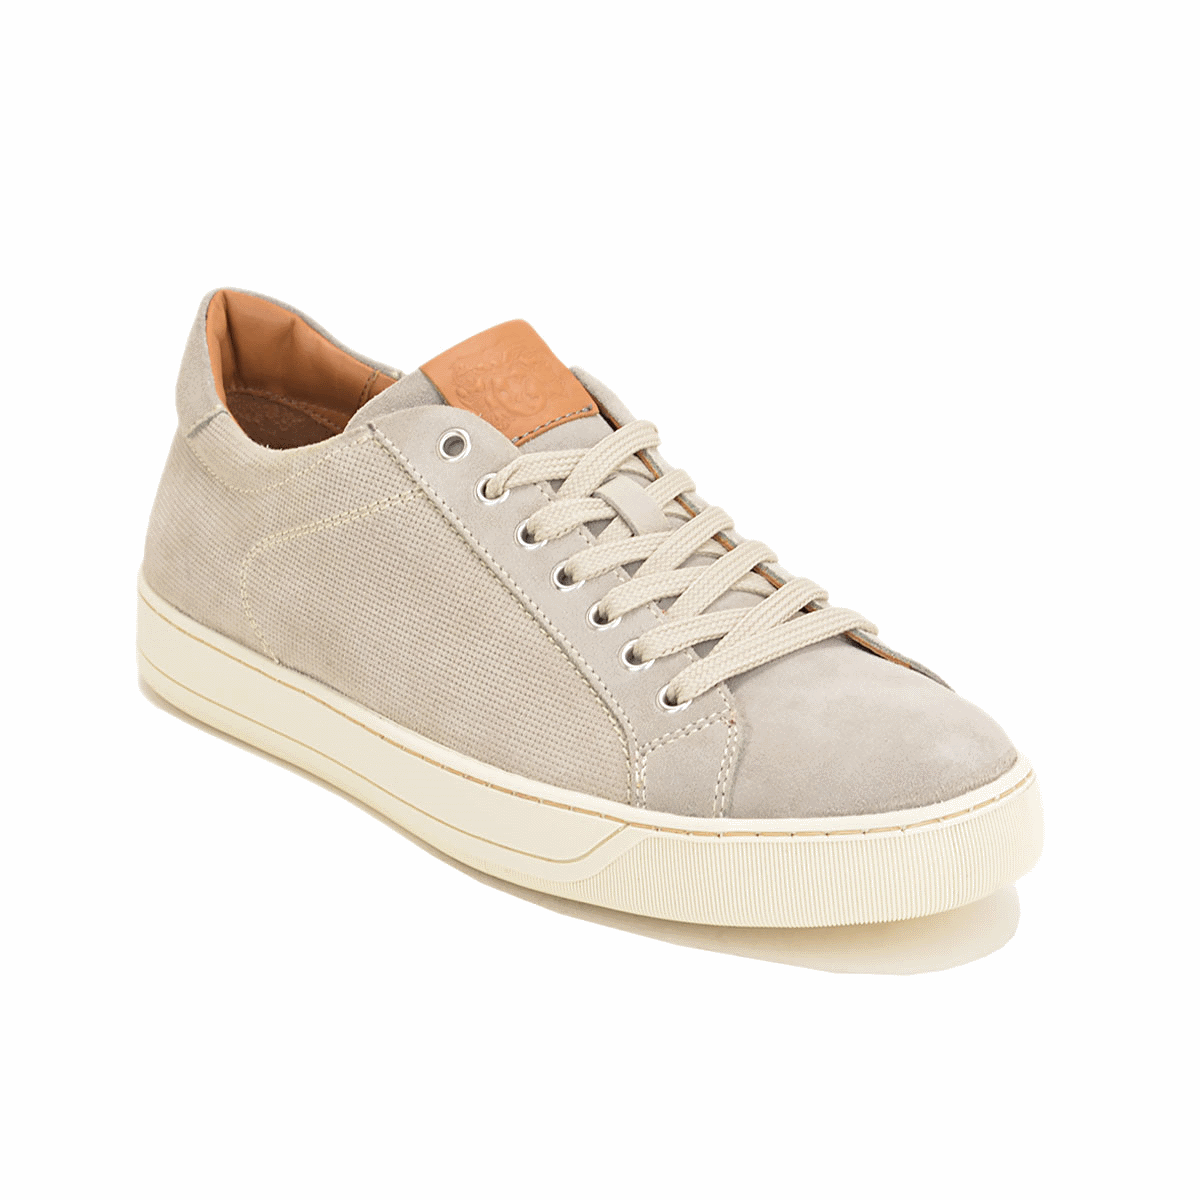 Bruno Magli Walter Suede Sneakers Gray Image